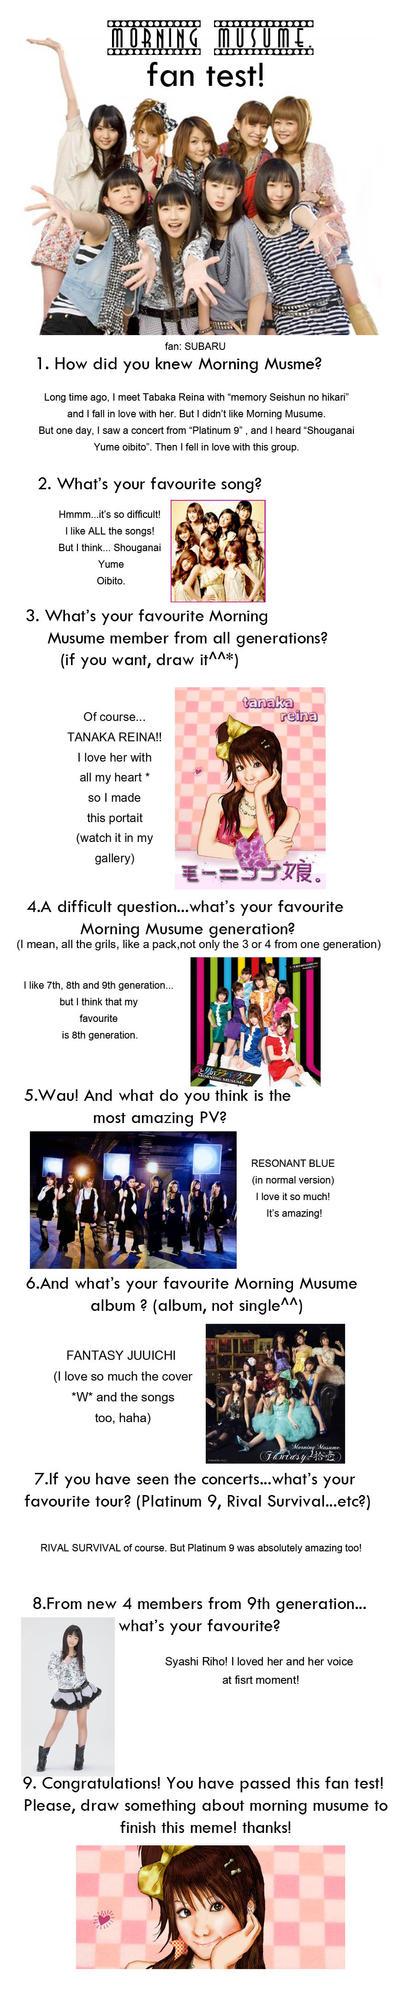 MORNING MUSUME: meme contest by SubaruMangaka